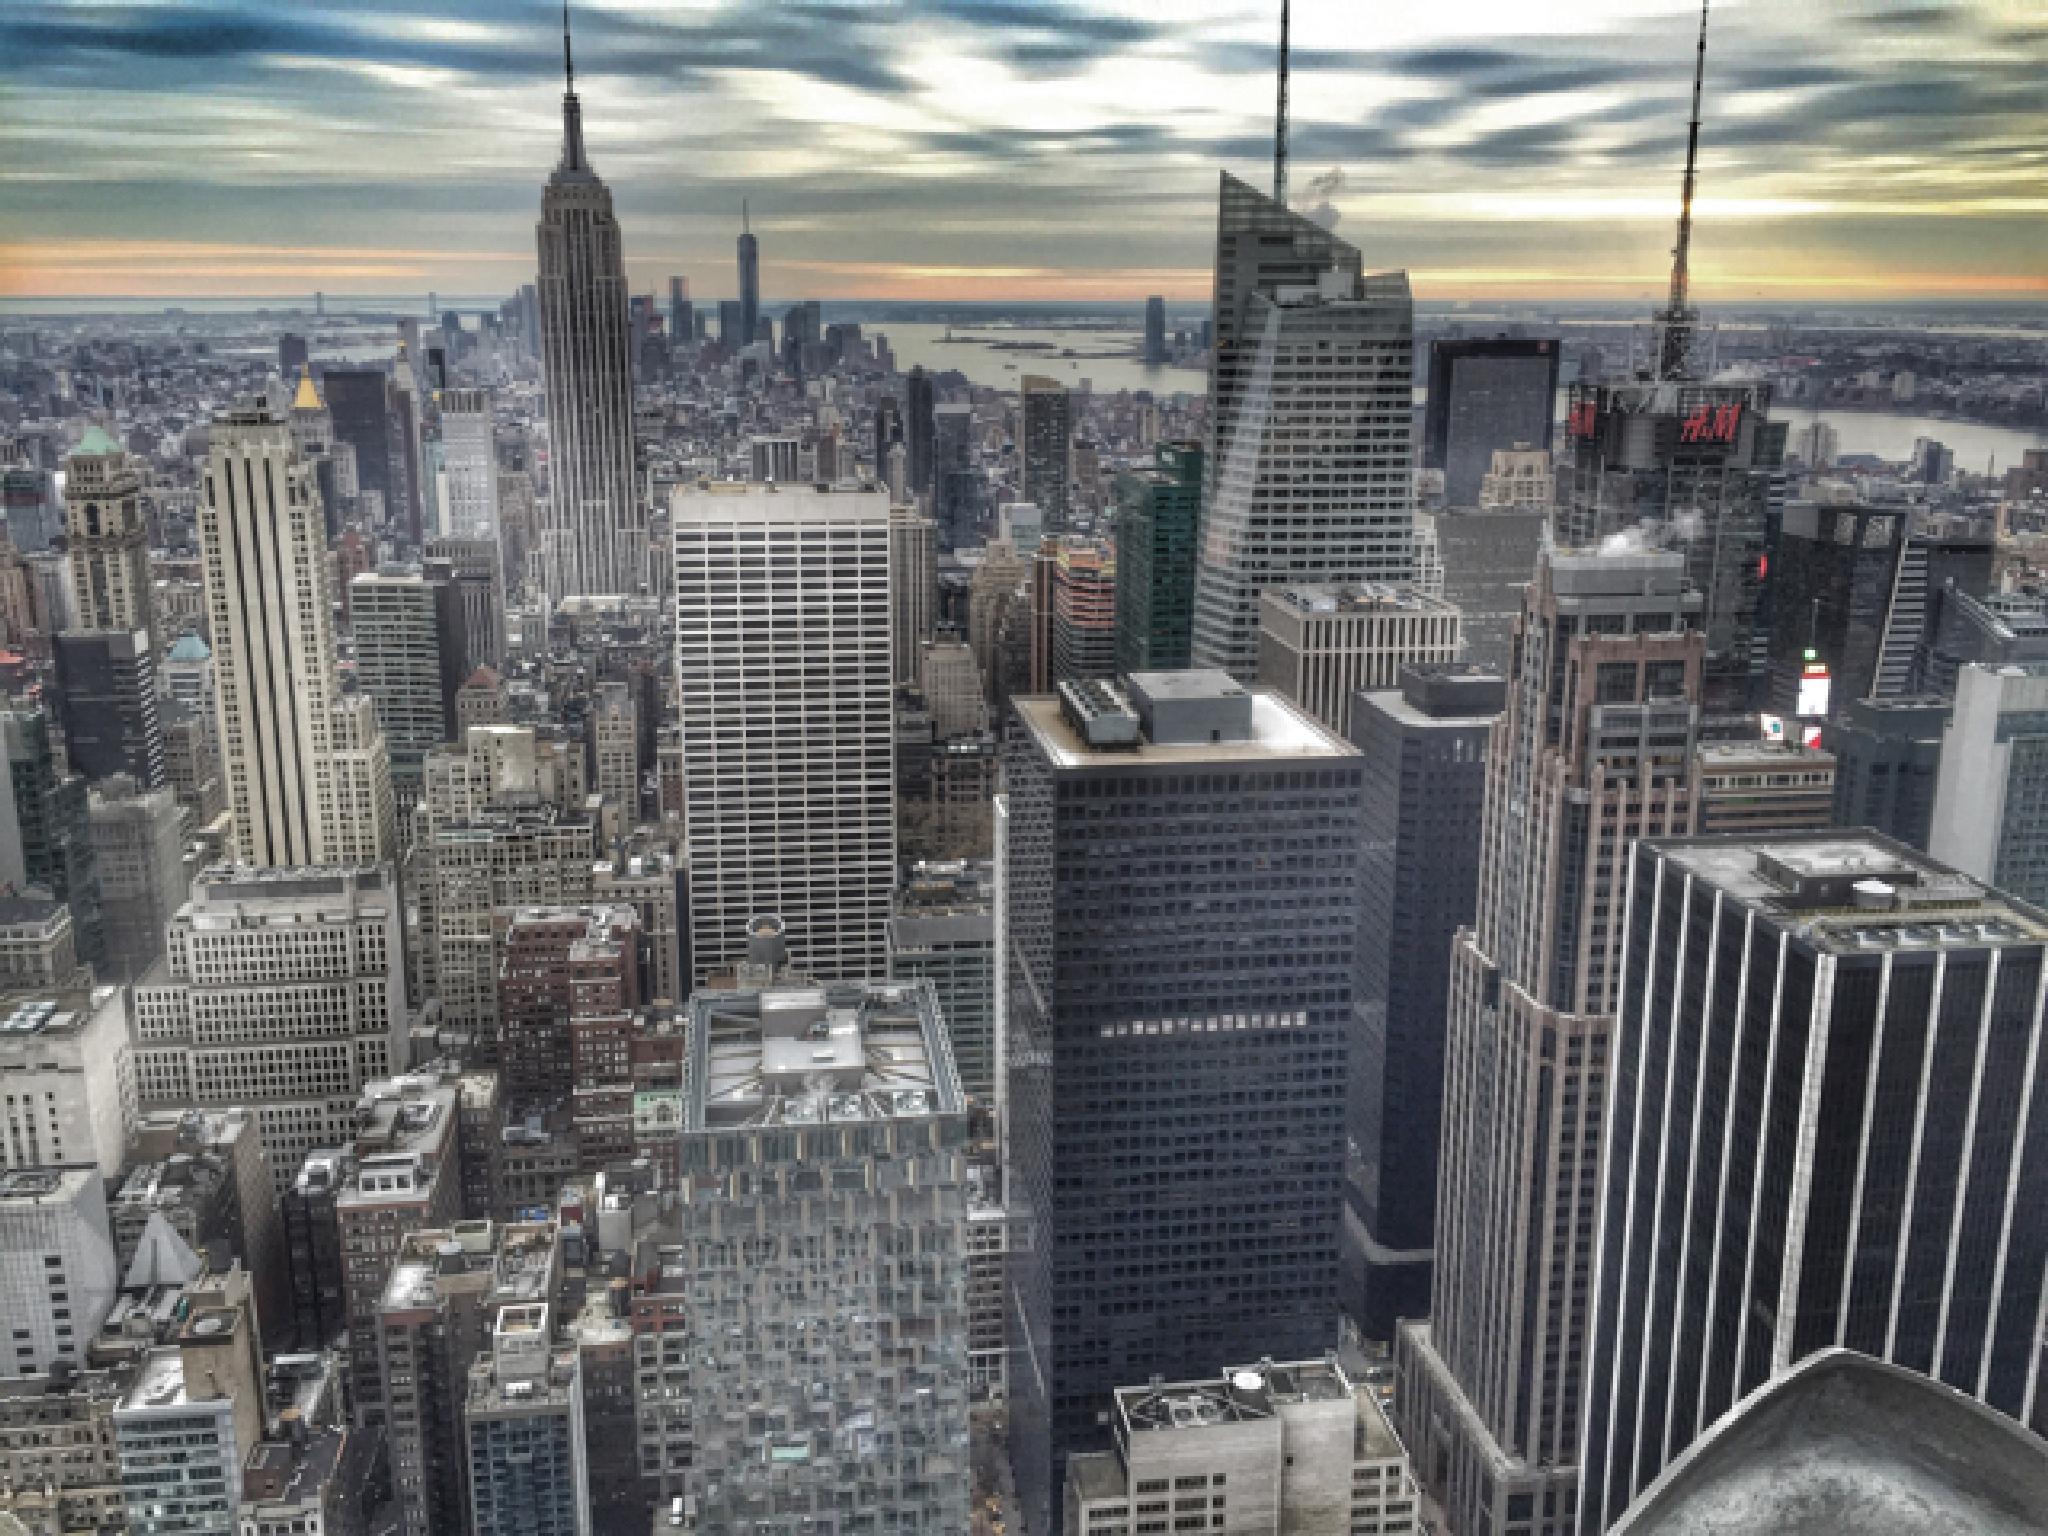 NYC by Paul Brown